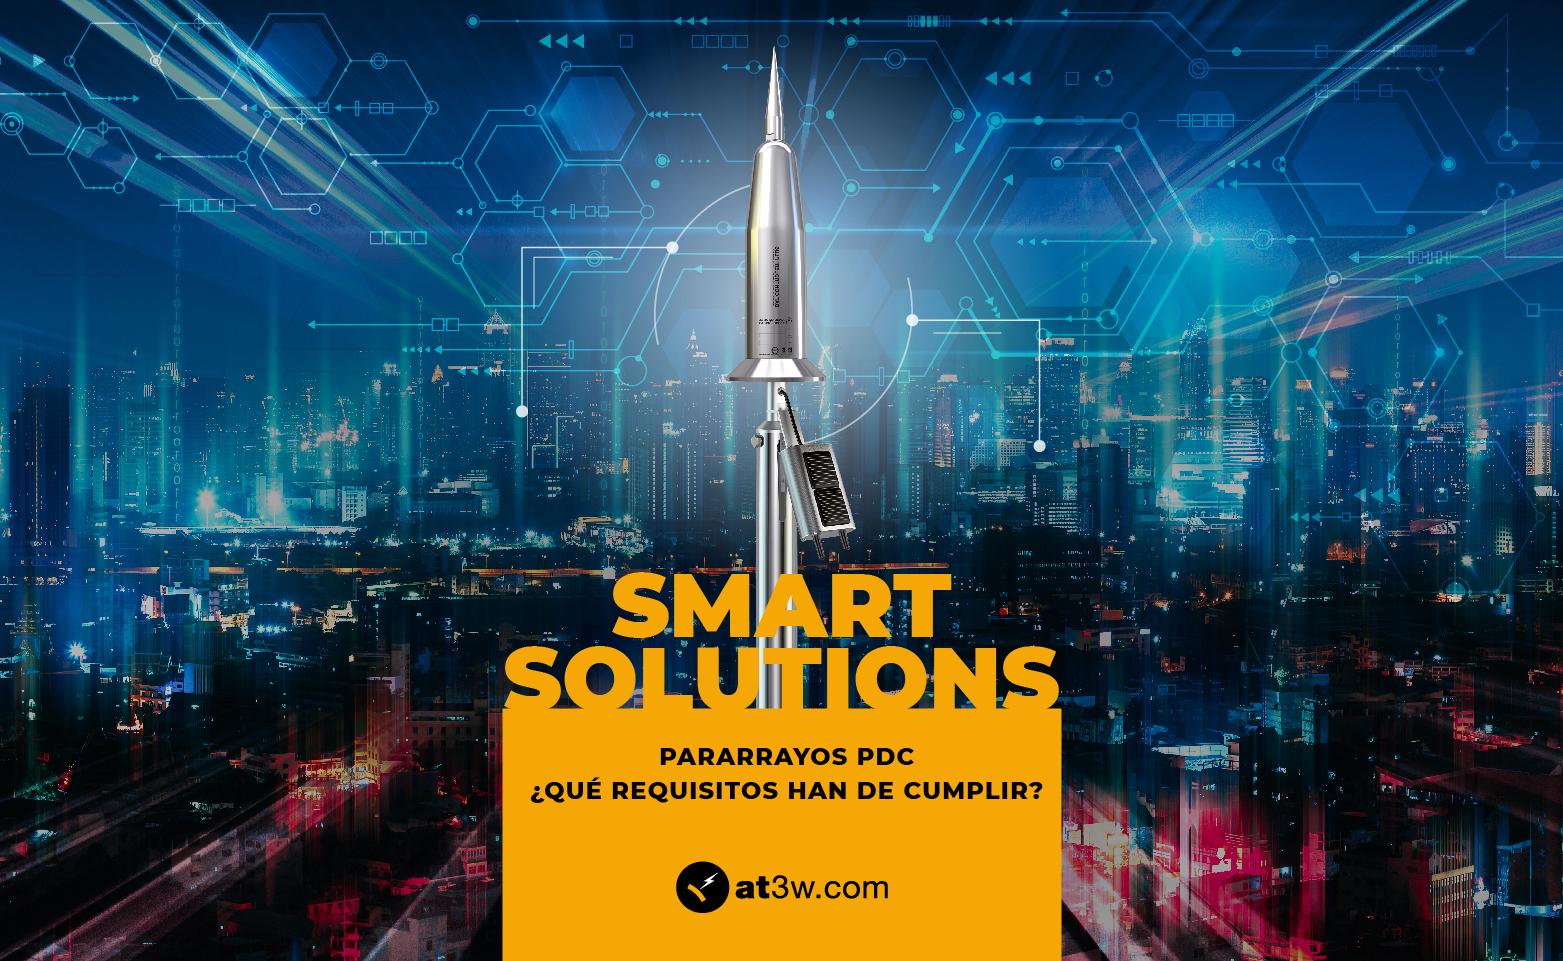 pararrayos dispositivo de cebado pdc smart solutions pdc